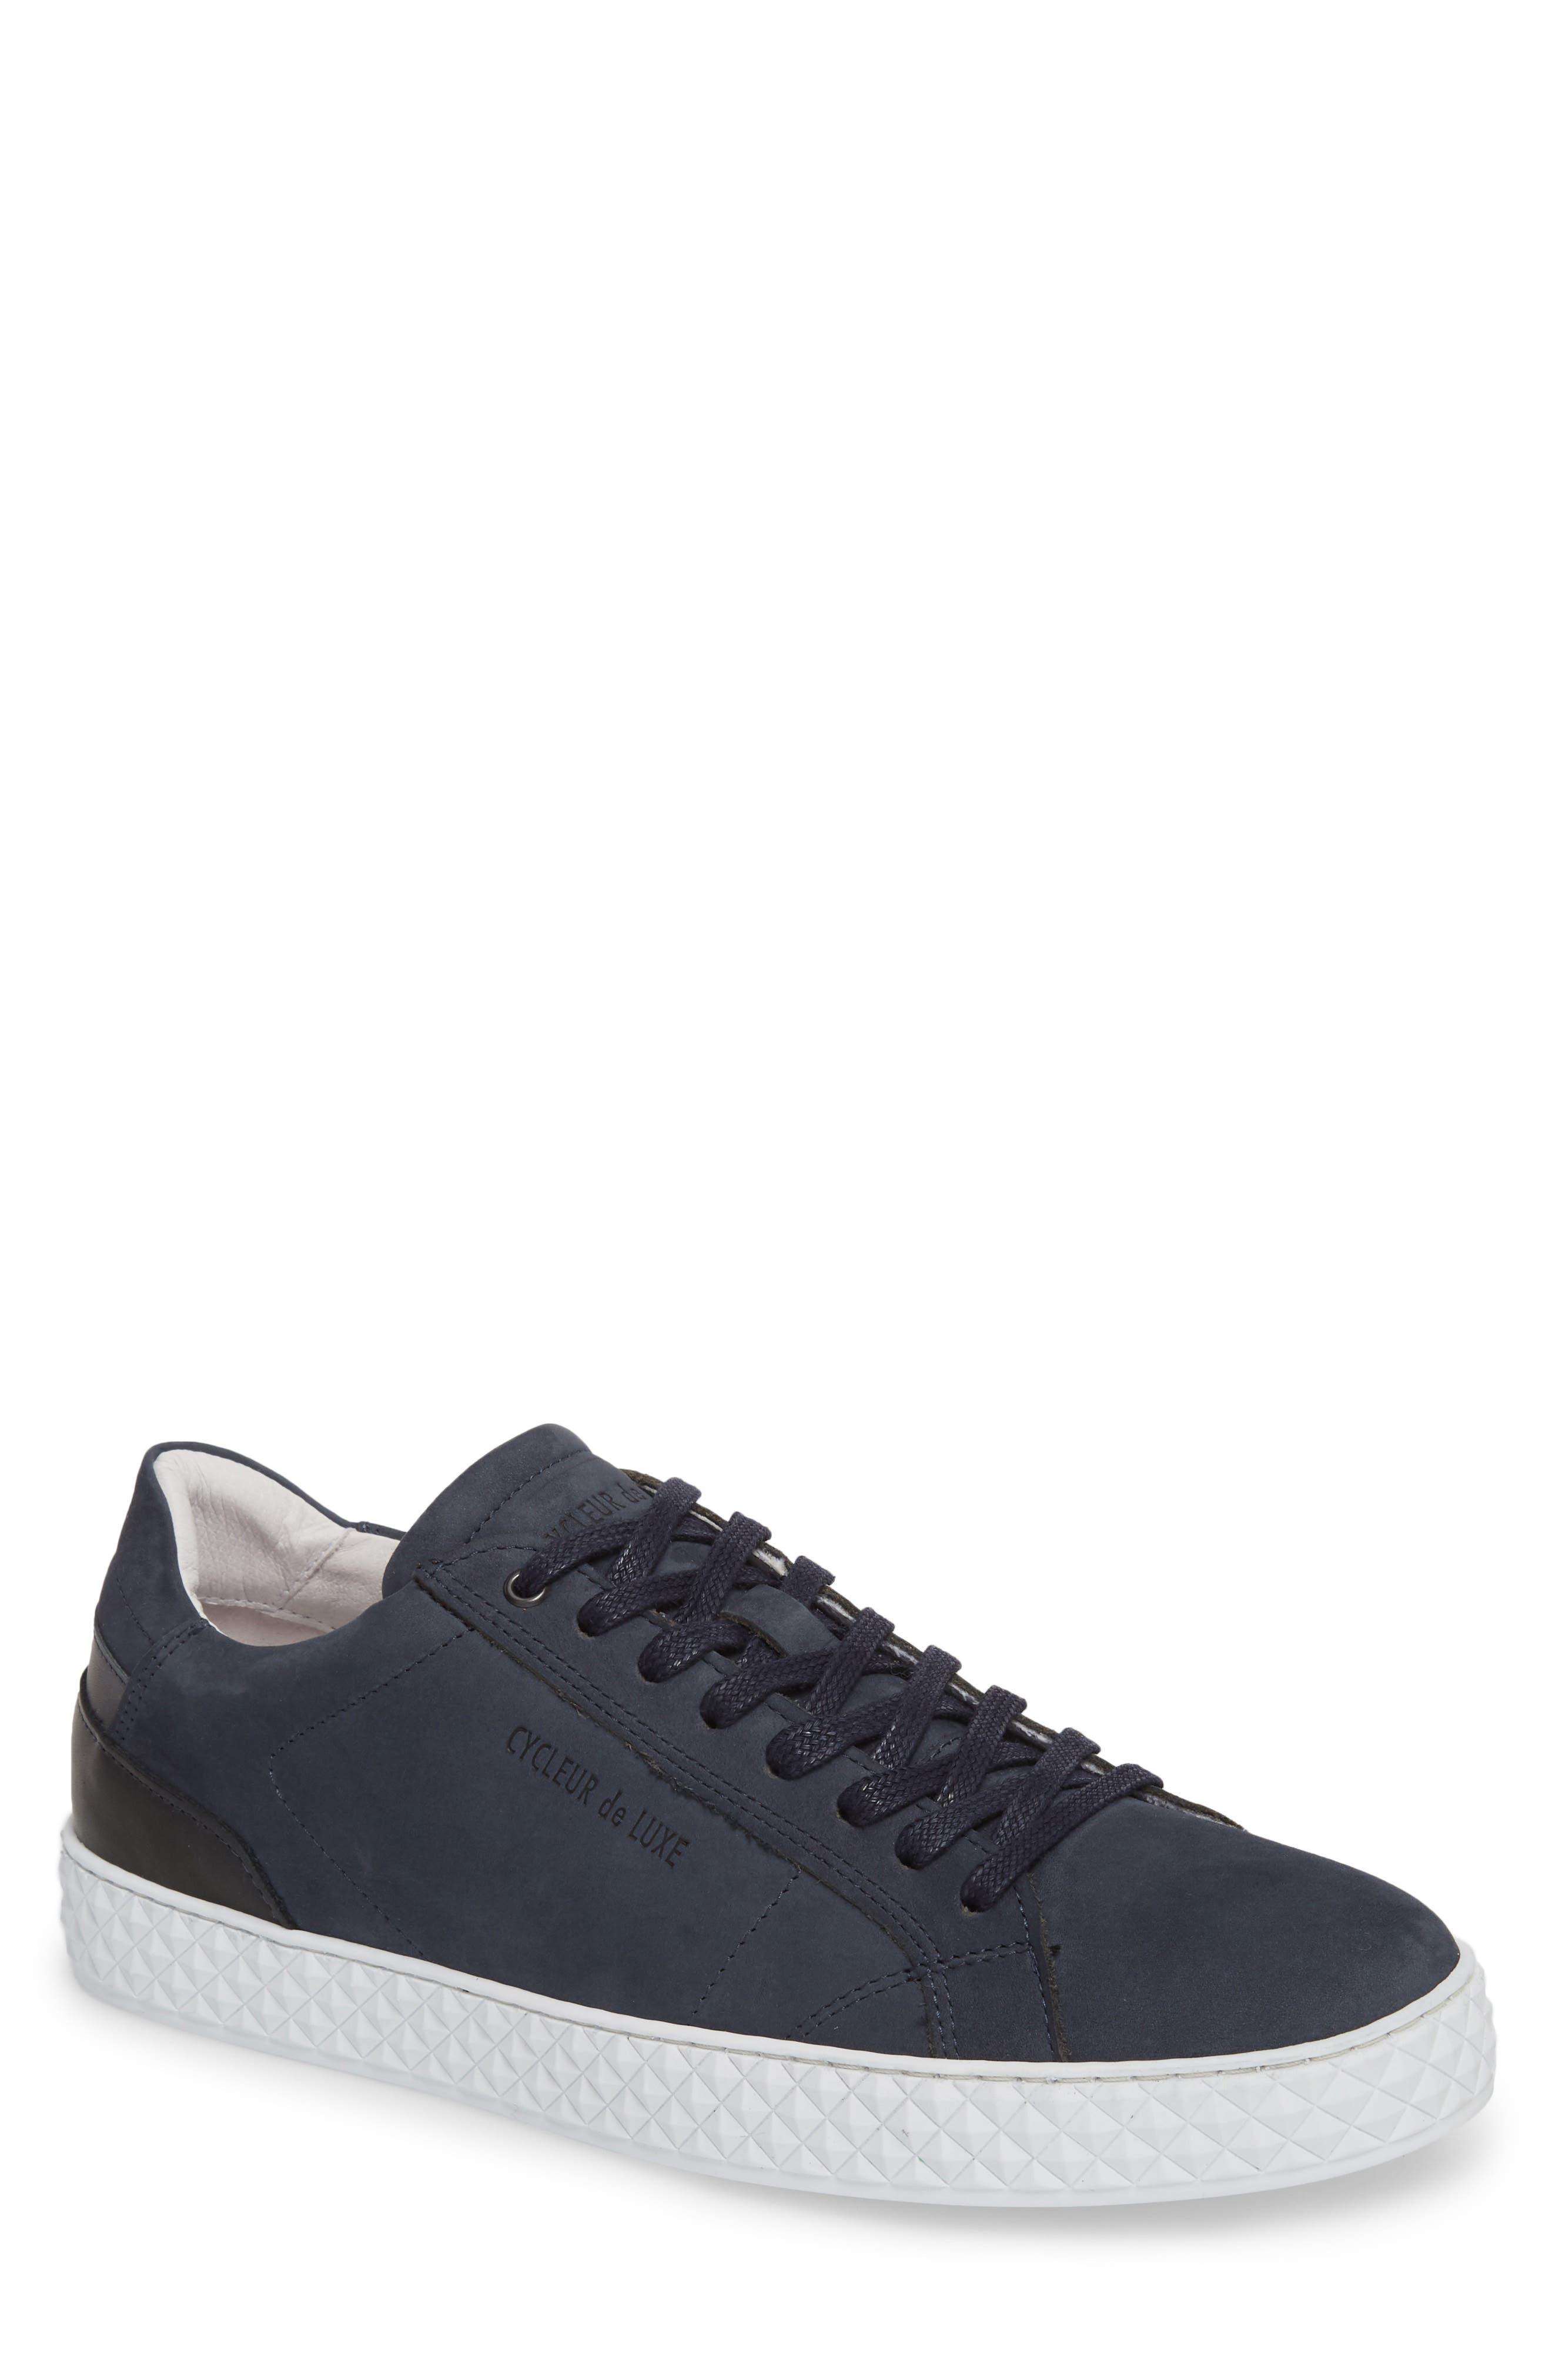 Bratislava Low Top Sneaker,                         Main,                         color, Navy Leather